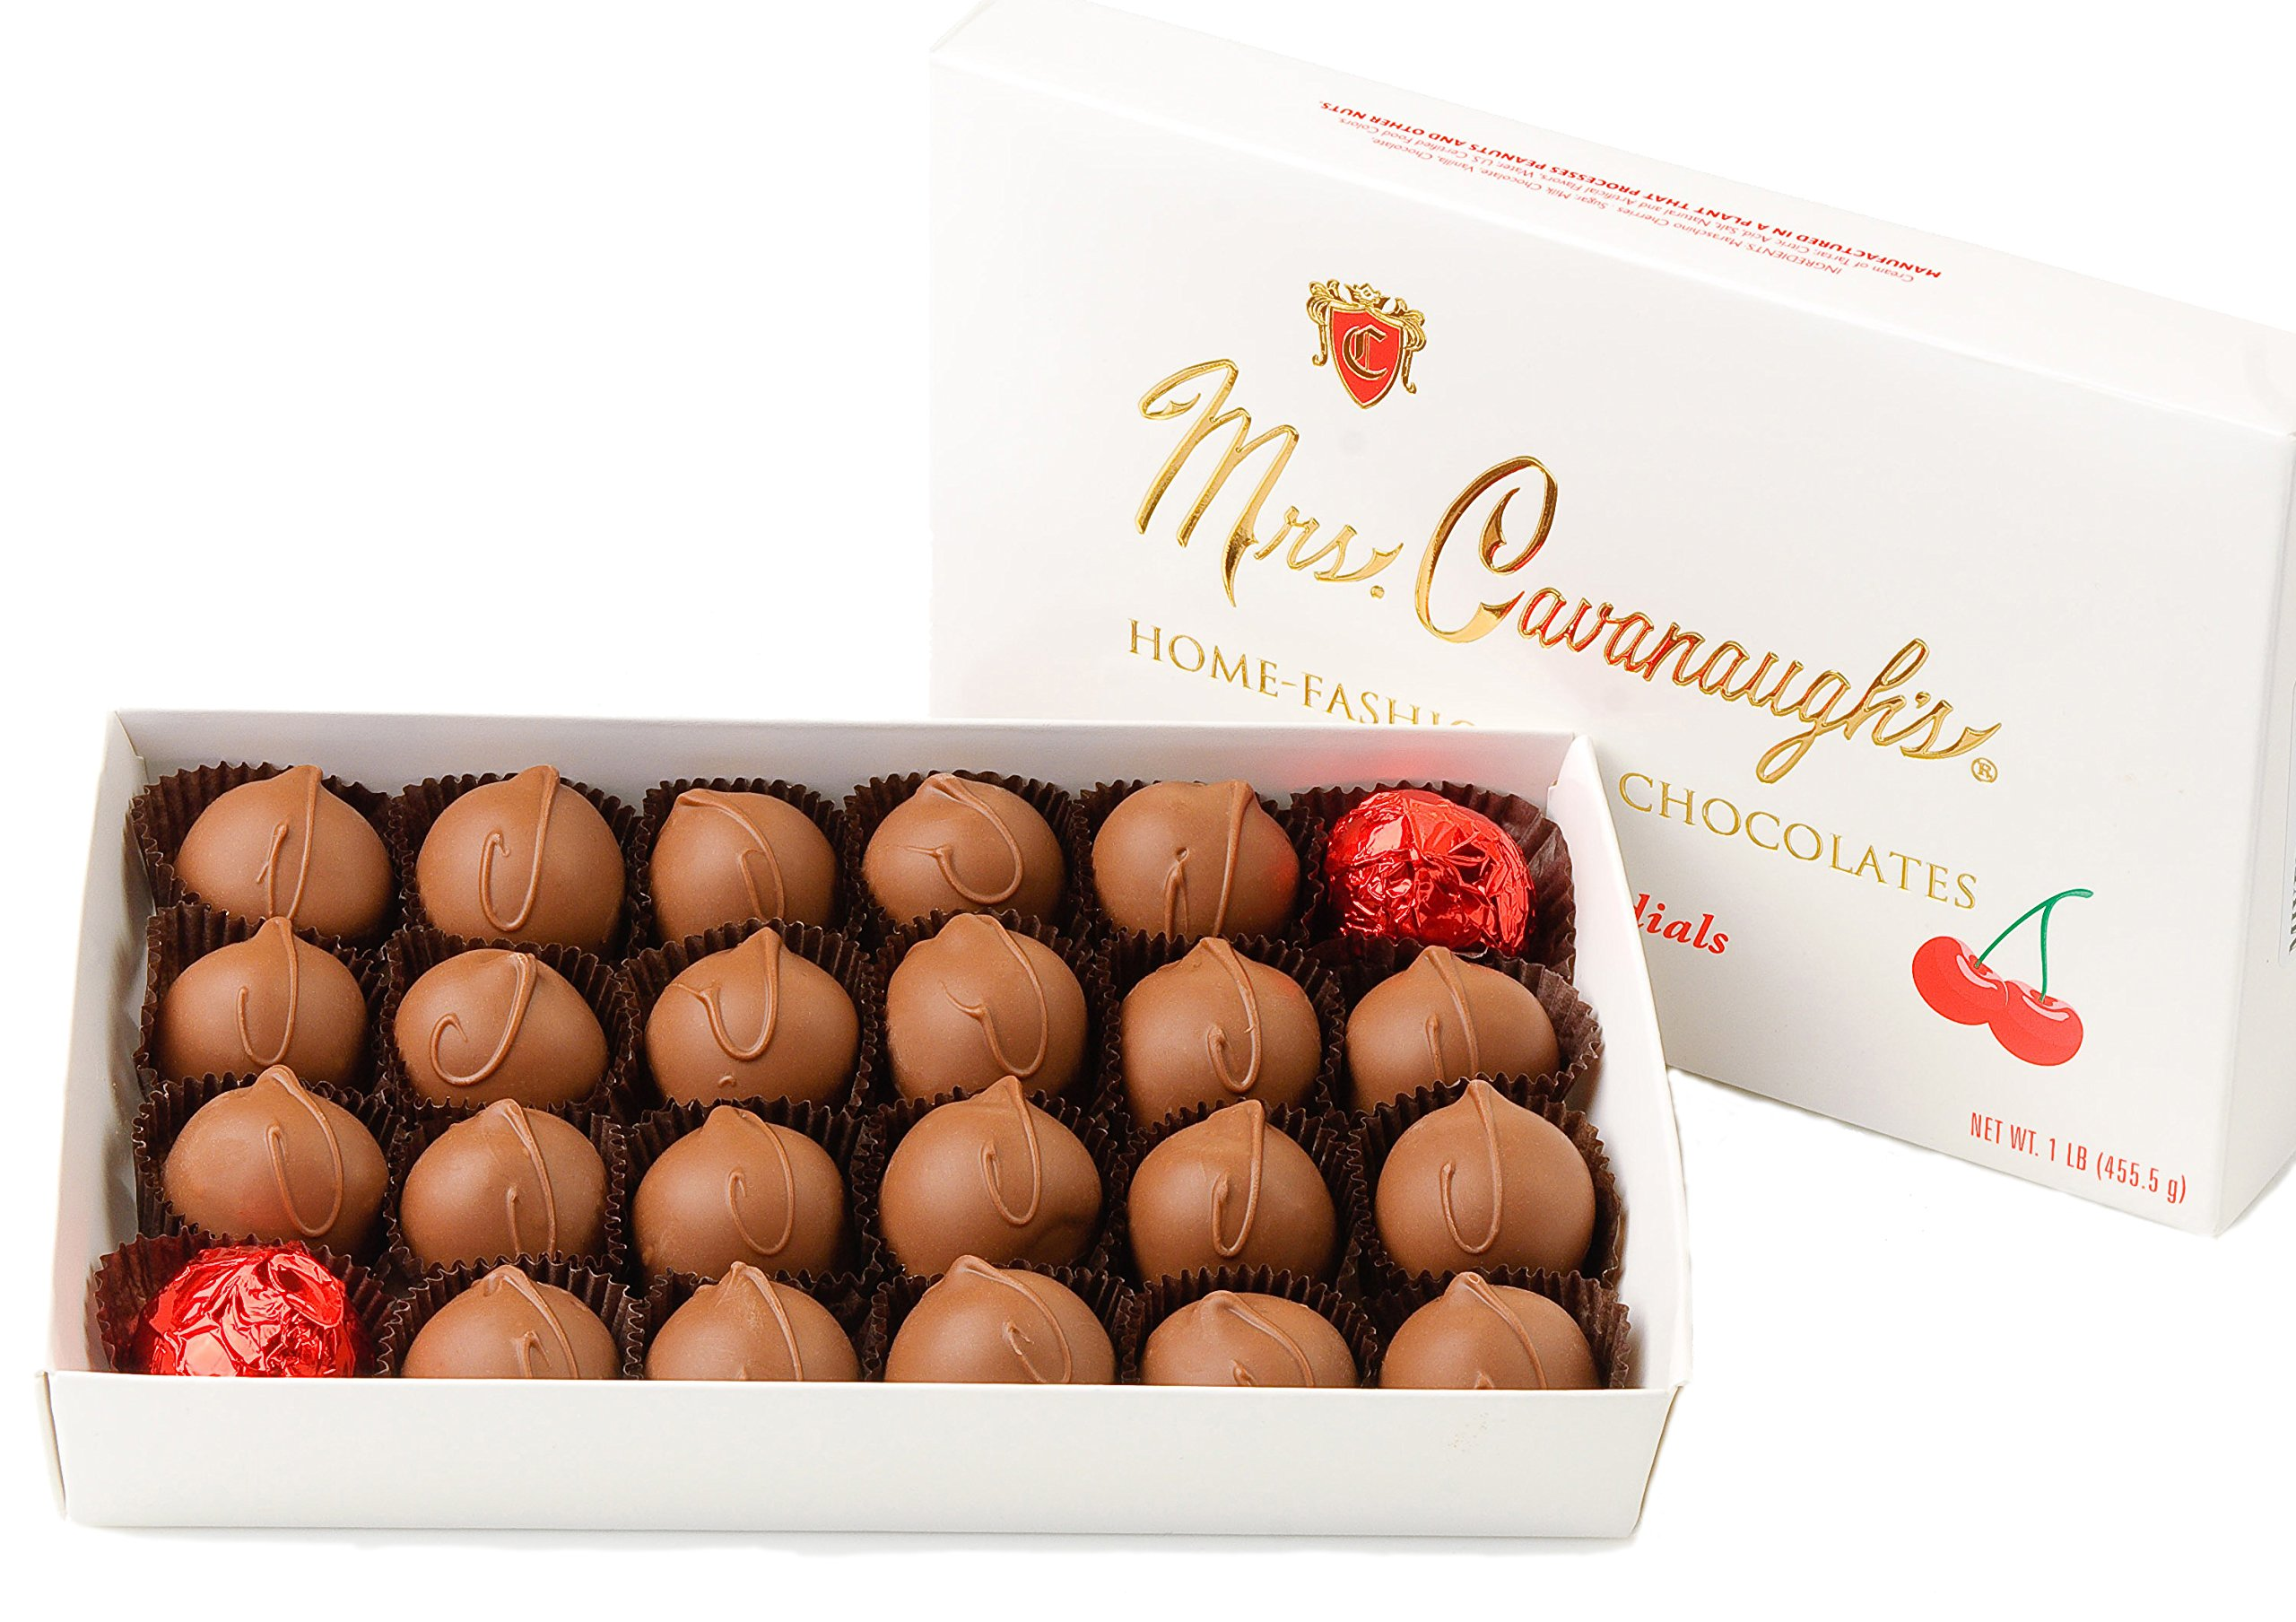 Mrs. Cavanaugh's Cherry Cordials 5-lb Boxed Milk Chocolate - Cherry Chocolates by Mrs. Cavanaugh's